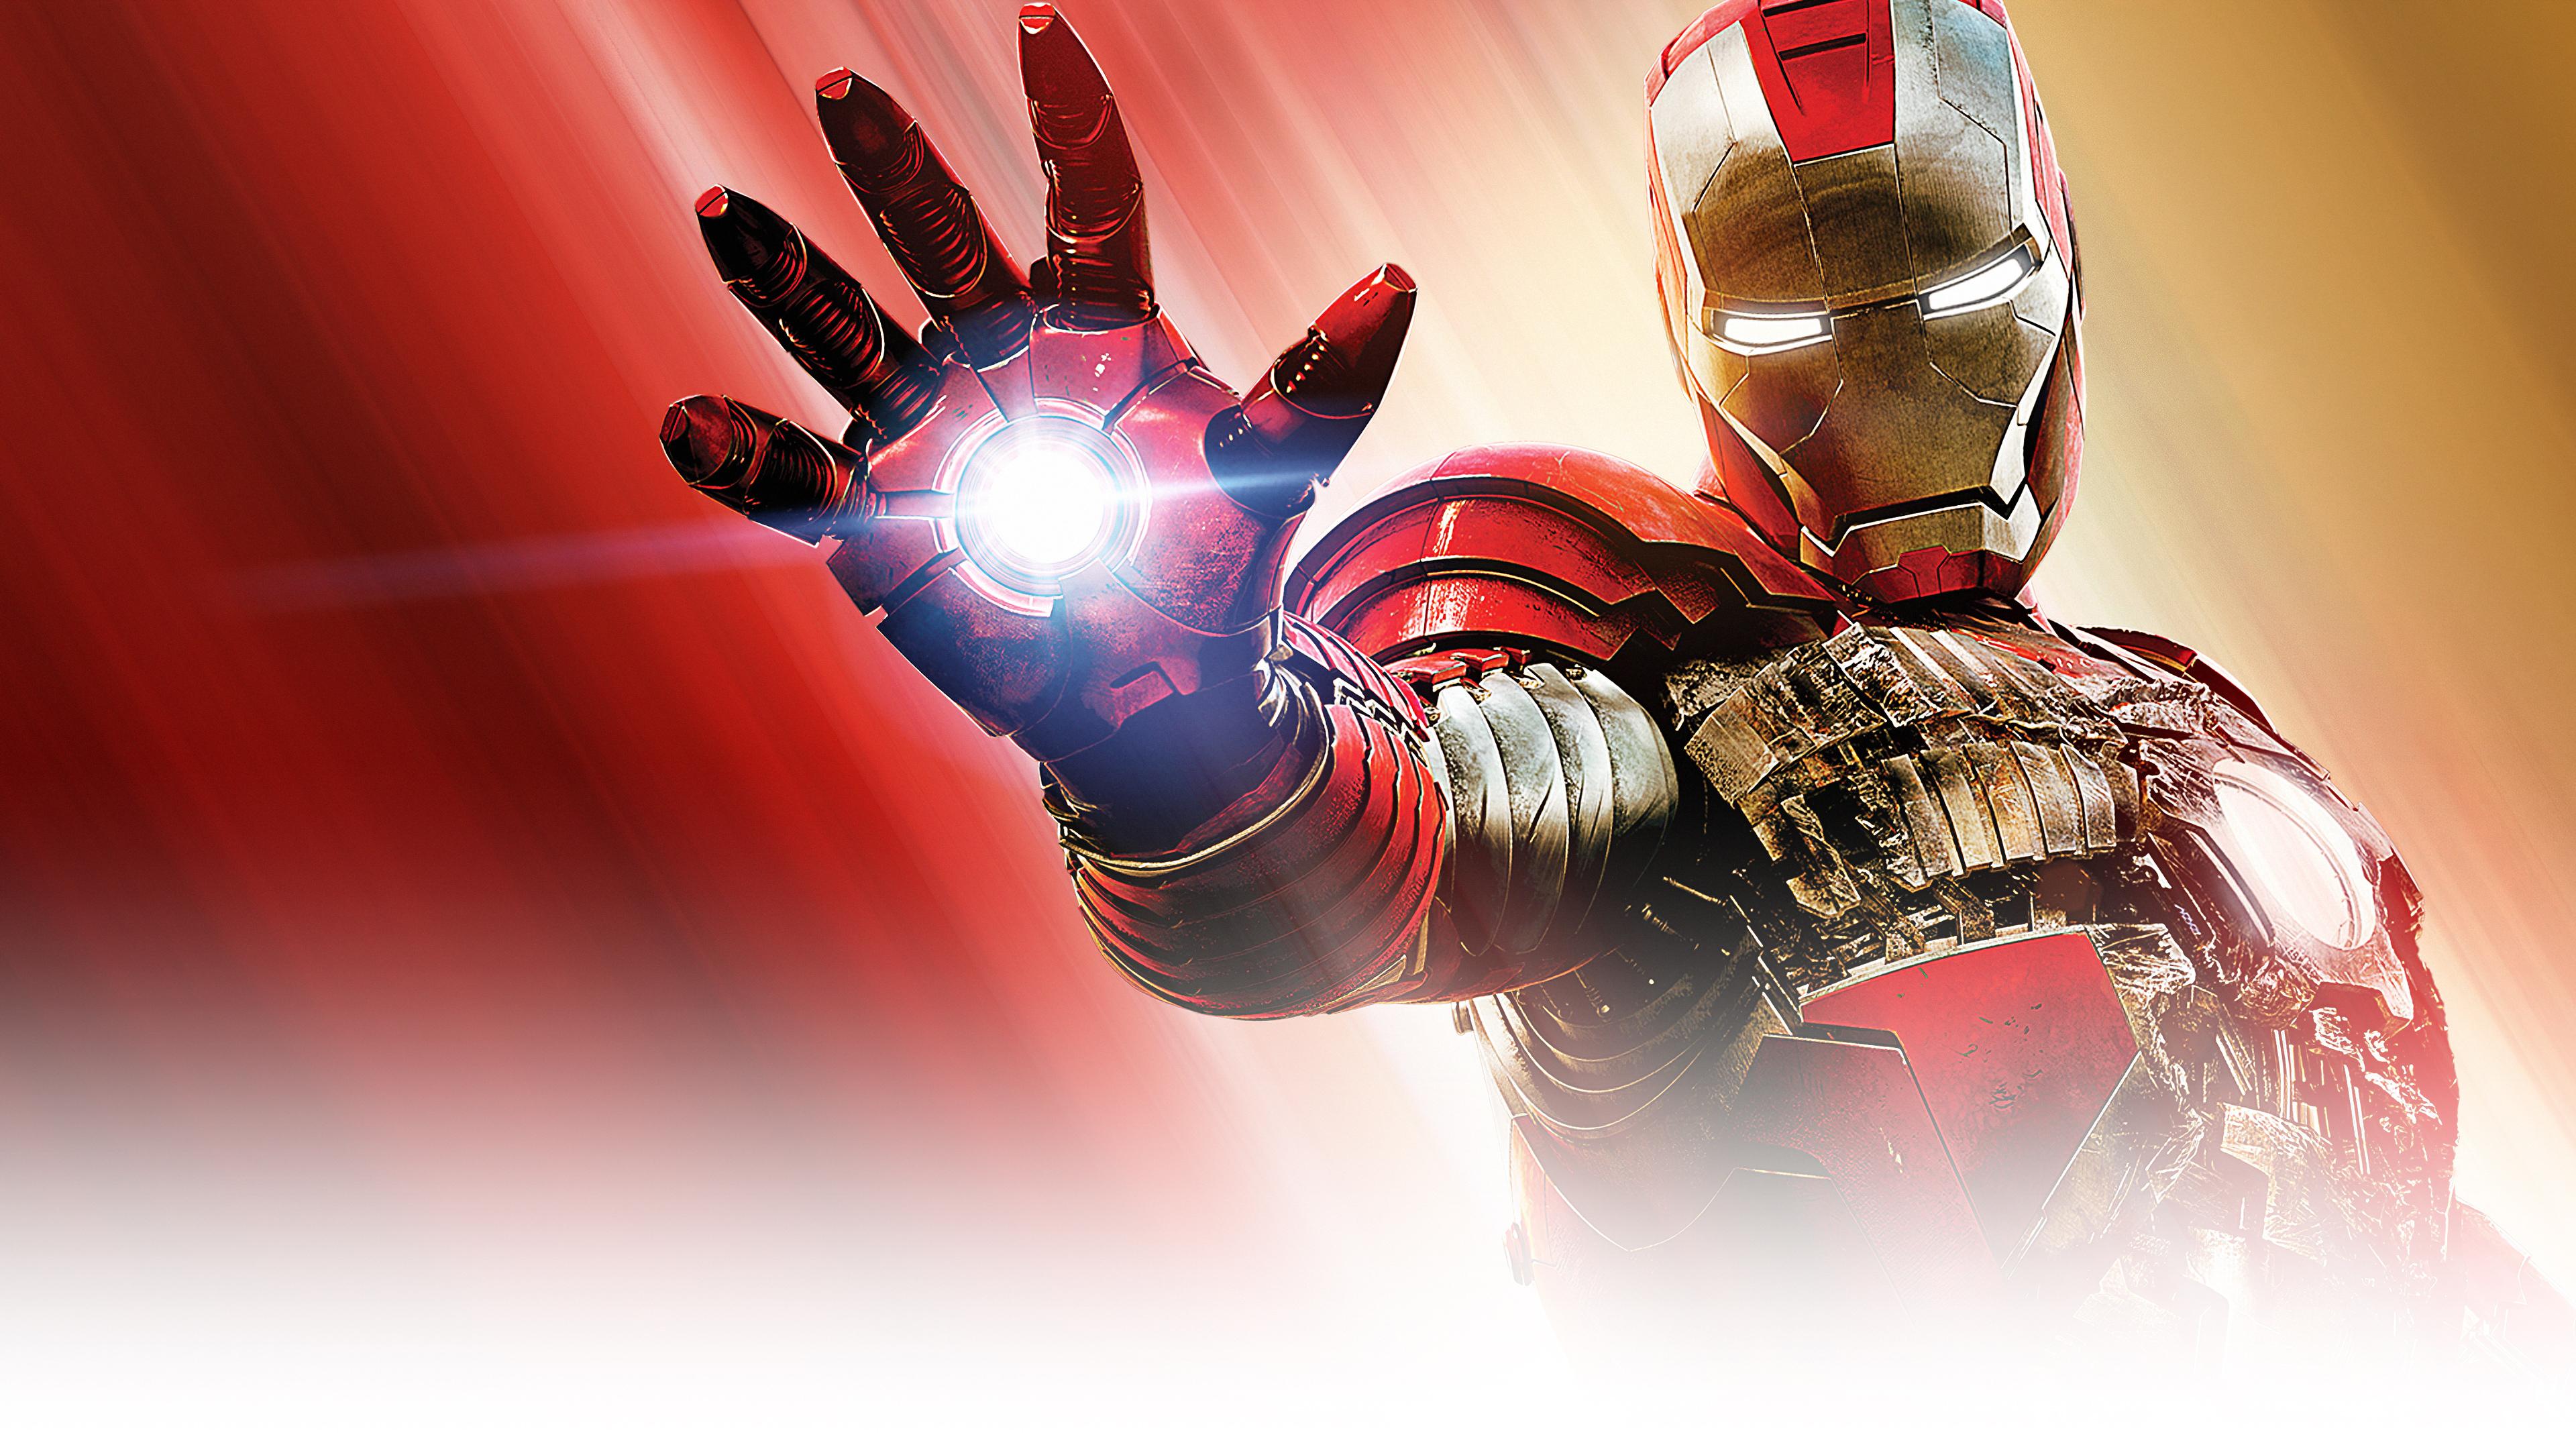 iron-man4k-2020-e1.jpg